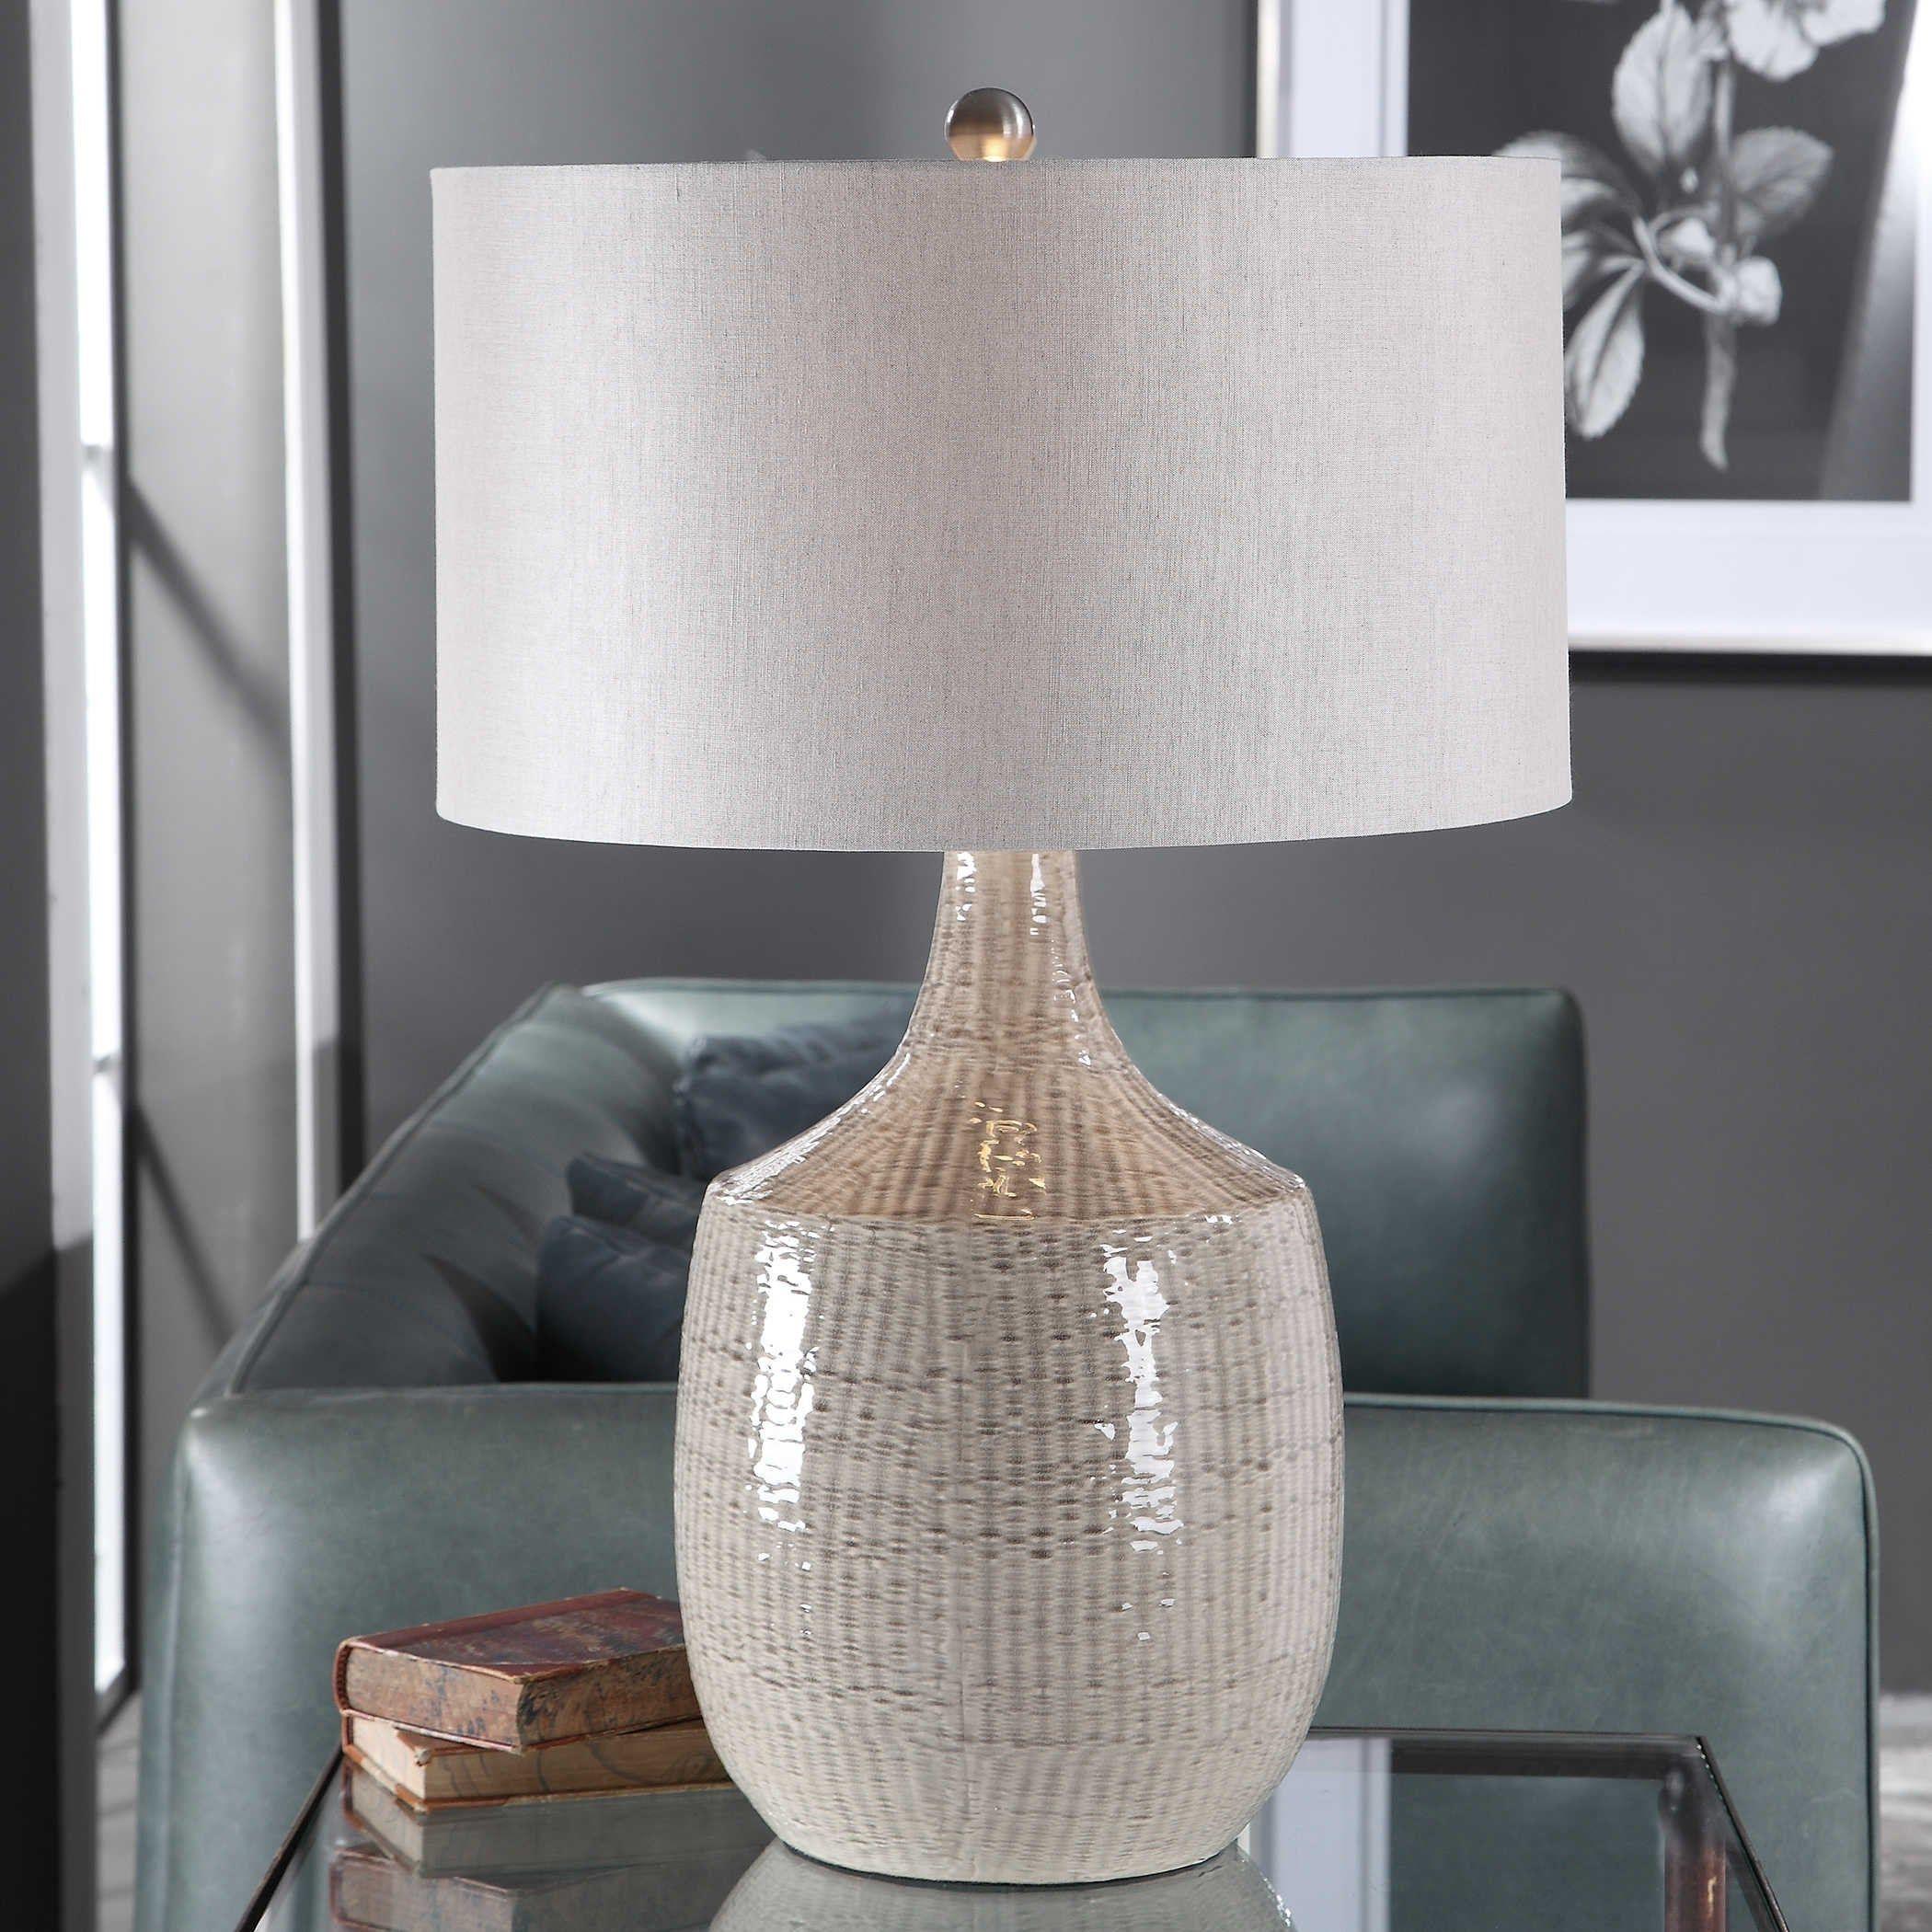 Felipe Gray Table Lamp Table Lamp Lamp Modern Lamp Handmade Lamp Ceramic Lamp Ceramic Table Lamp Entry Way In 2020 Grey Table Lamps Table Lamp Design Table Lamp